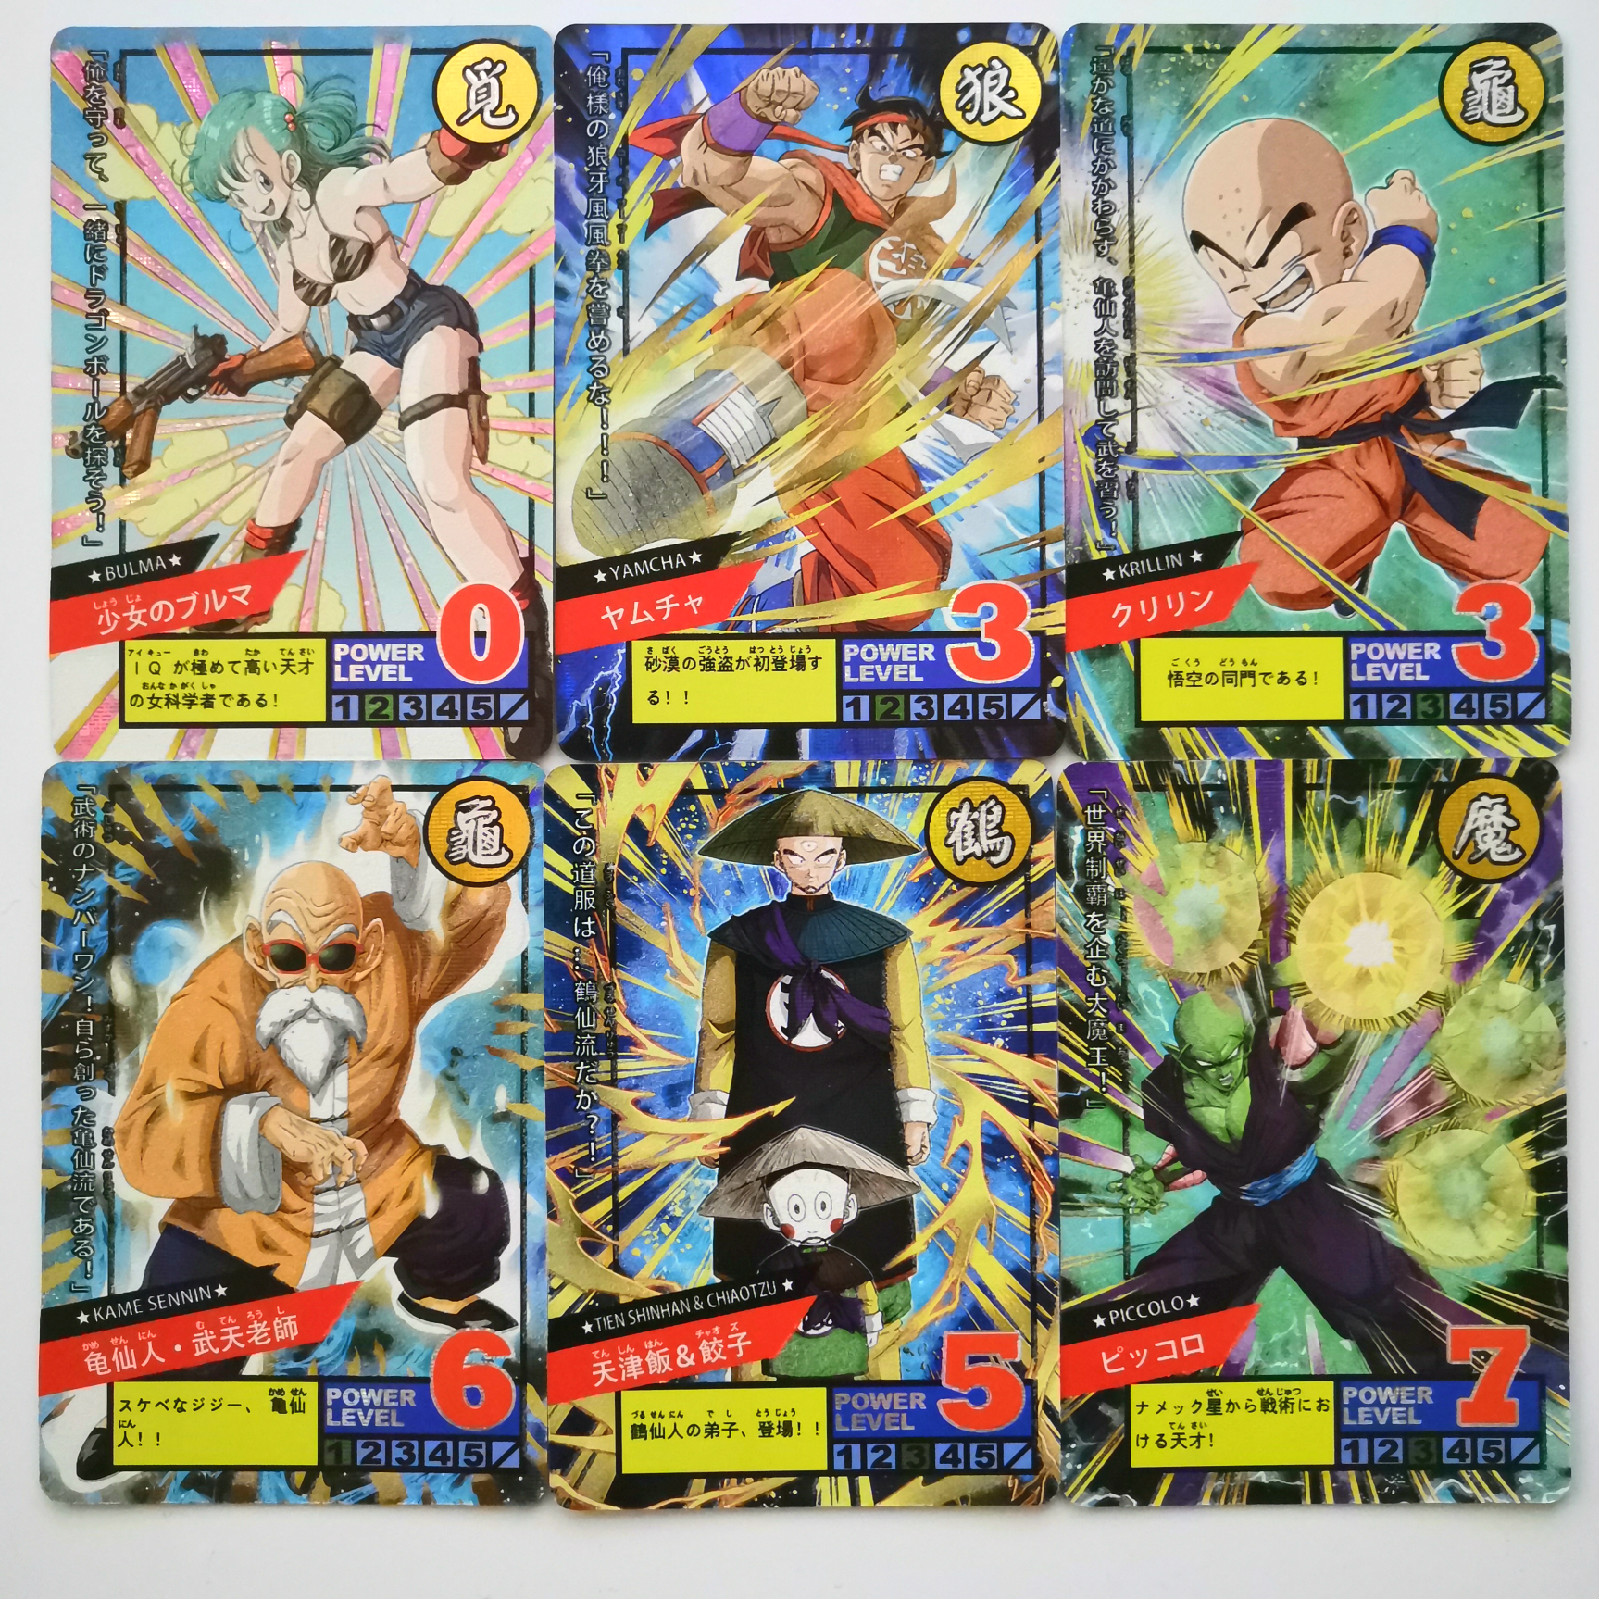 27pcs Super Dragon Ball Z Heroes Battle Luminous Card Ultra Instinct Goku Vegeta Game Collection Anime Cards